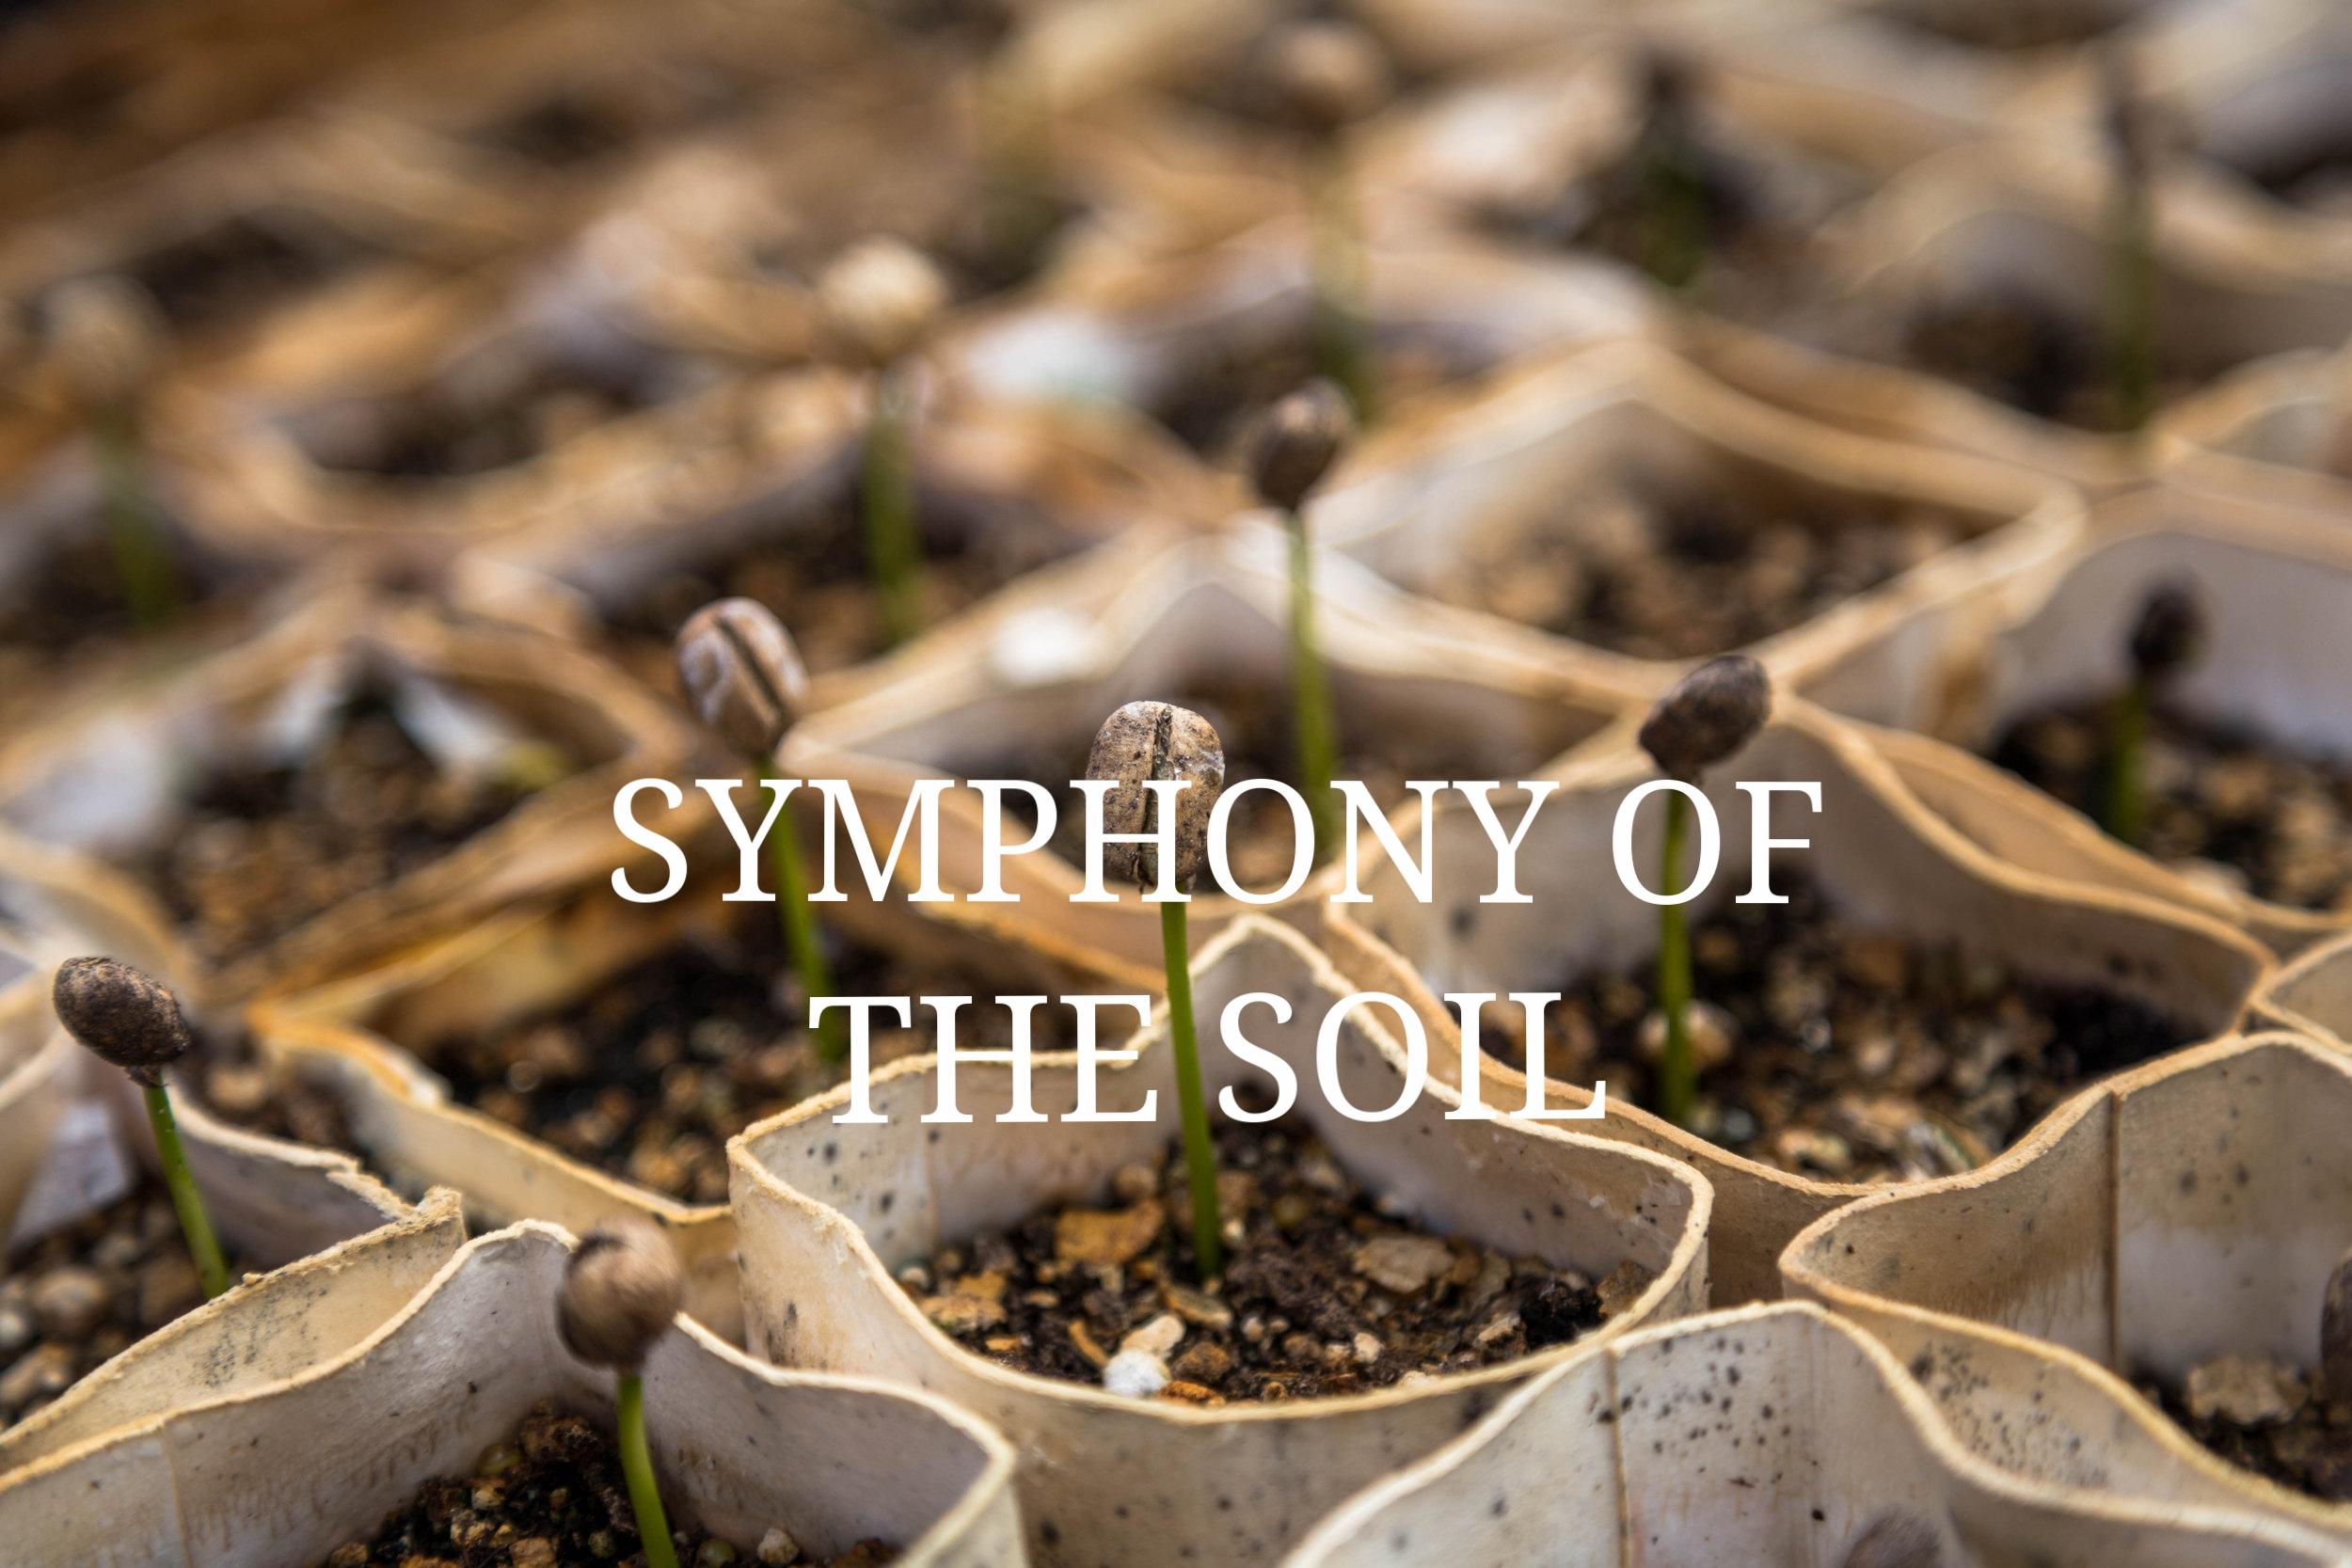 symphony of the soil @ vimeo